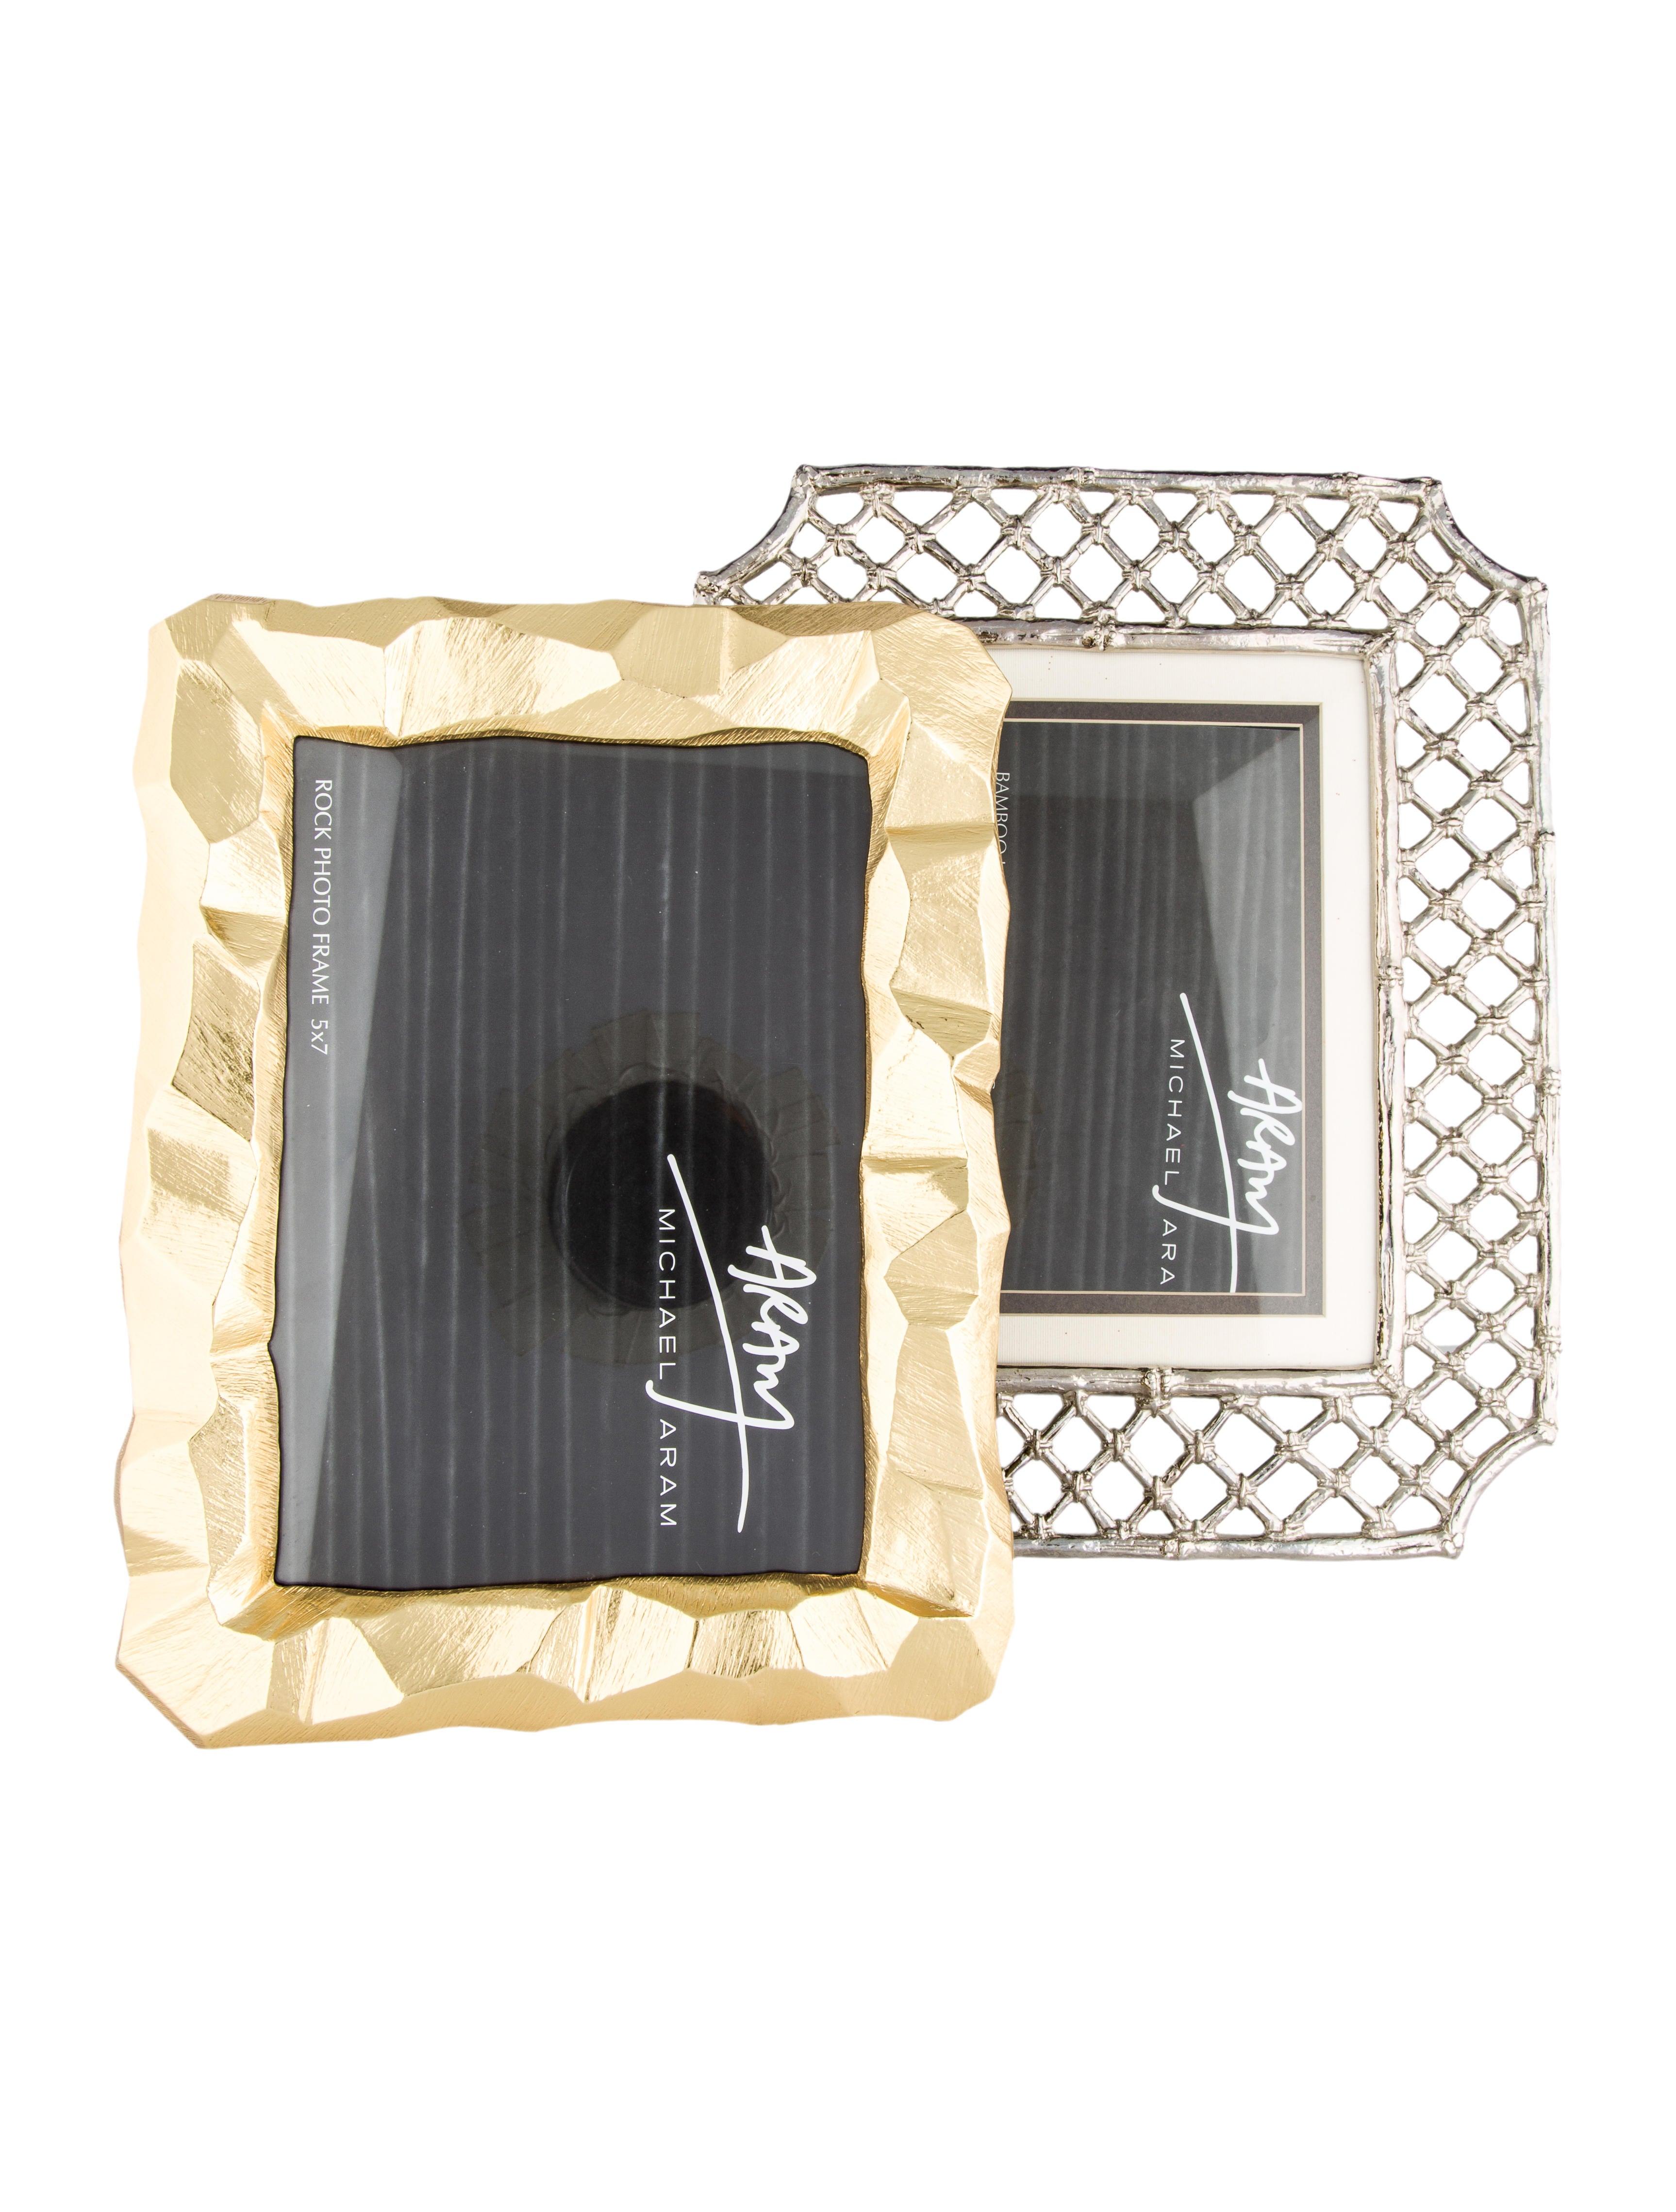 Michael Aram Picture Frames - Decor & Accessories - MCA20632 | The ...